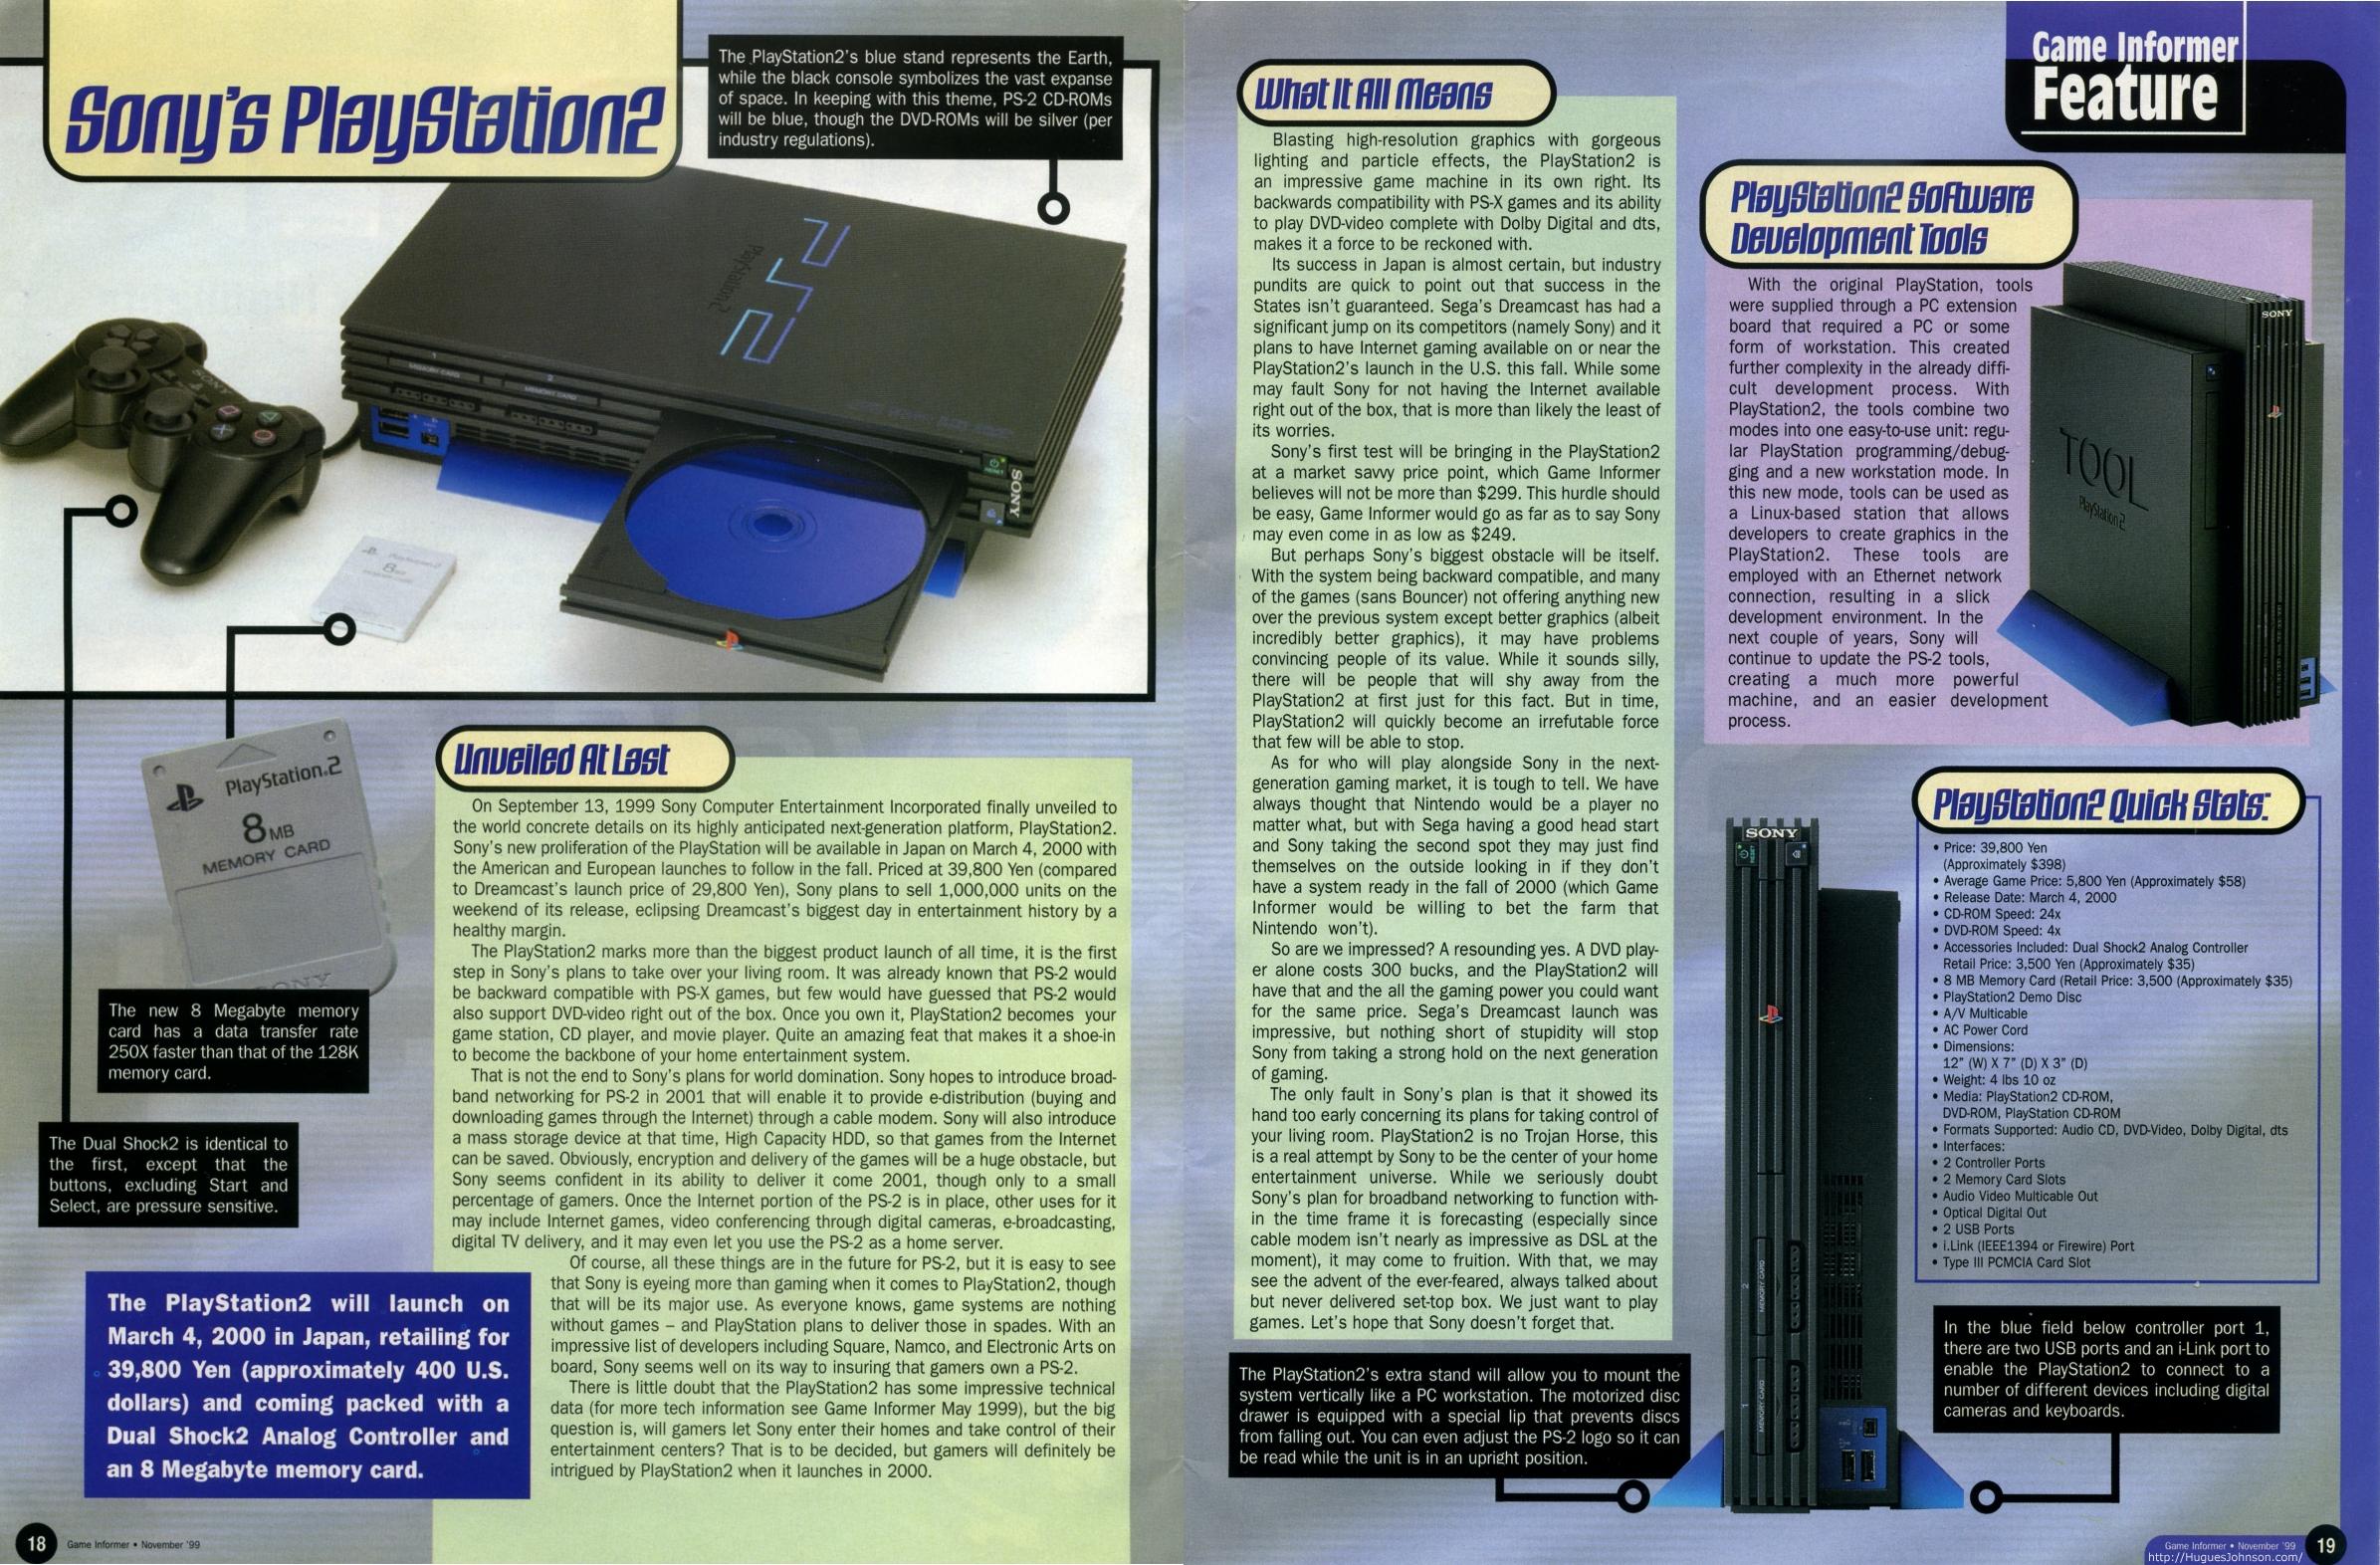 HuguesJohnson.com - Random Video Game Scans